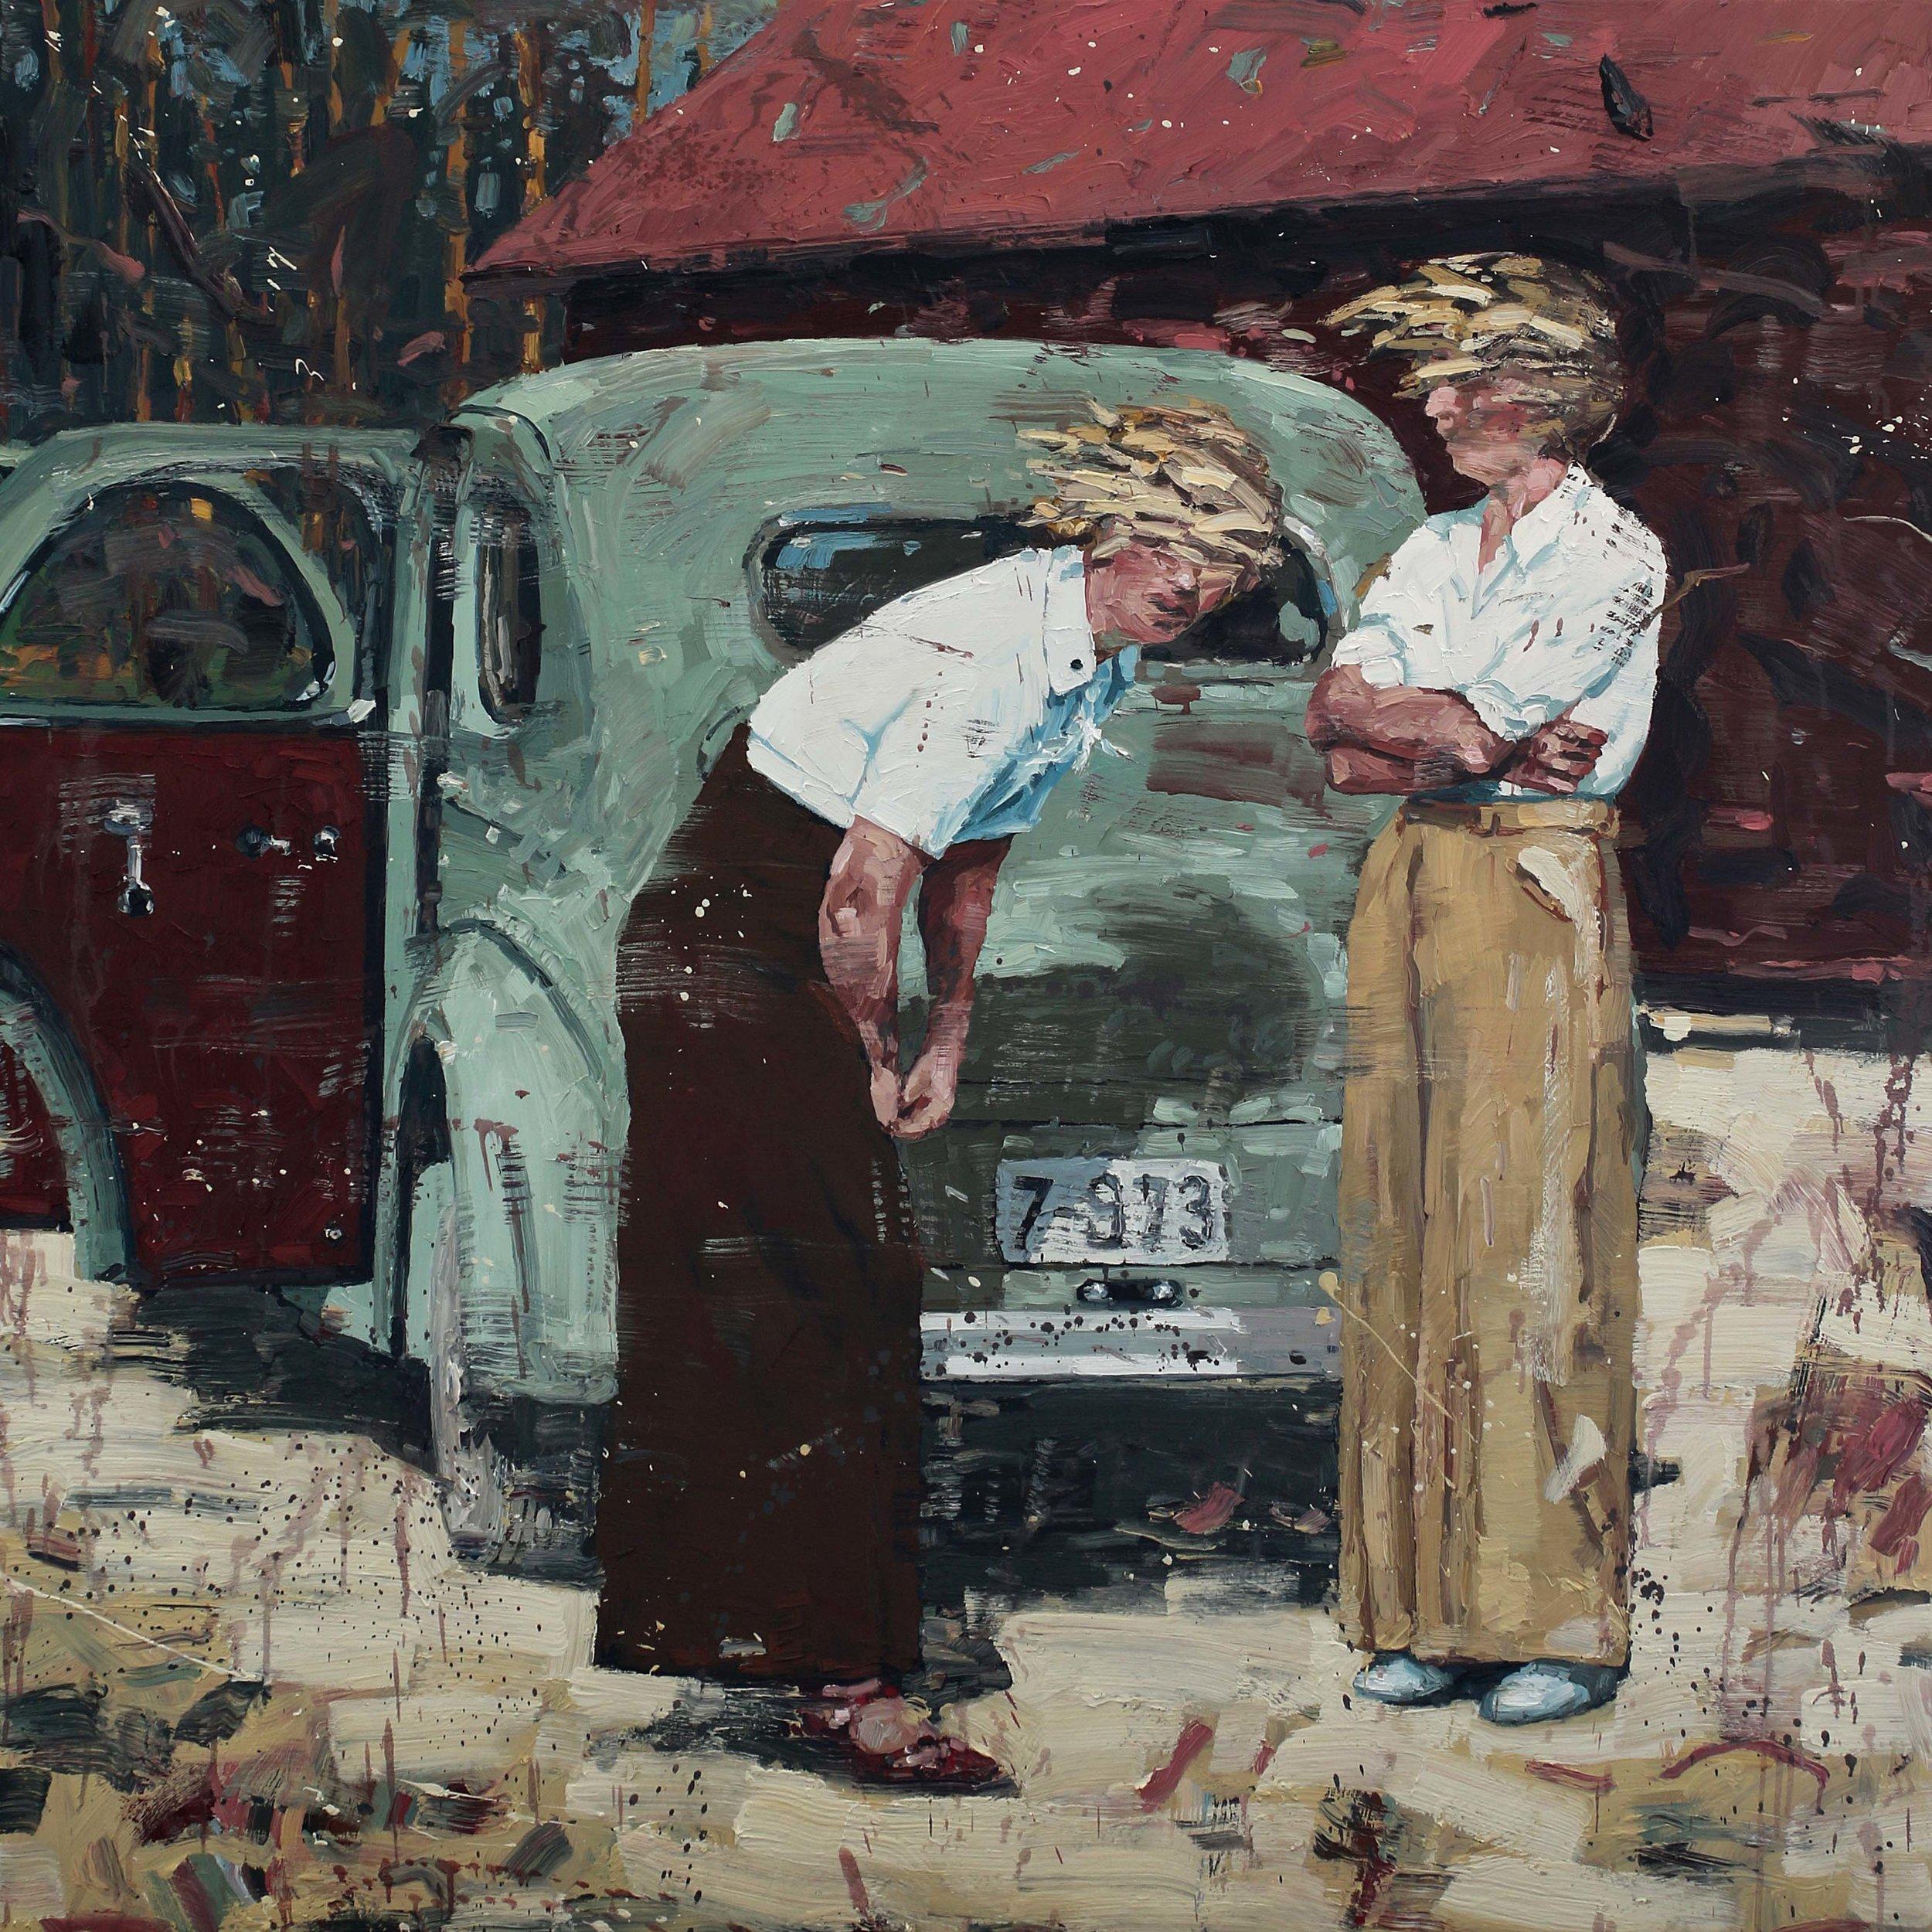 Jenter med vind i håret – 150x150 cm – Eggoljetempera på lerret – Privat eie